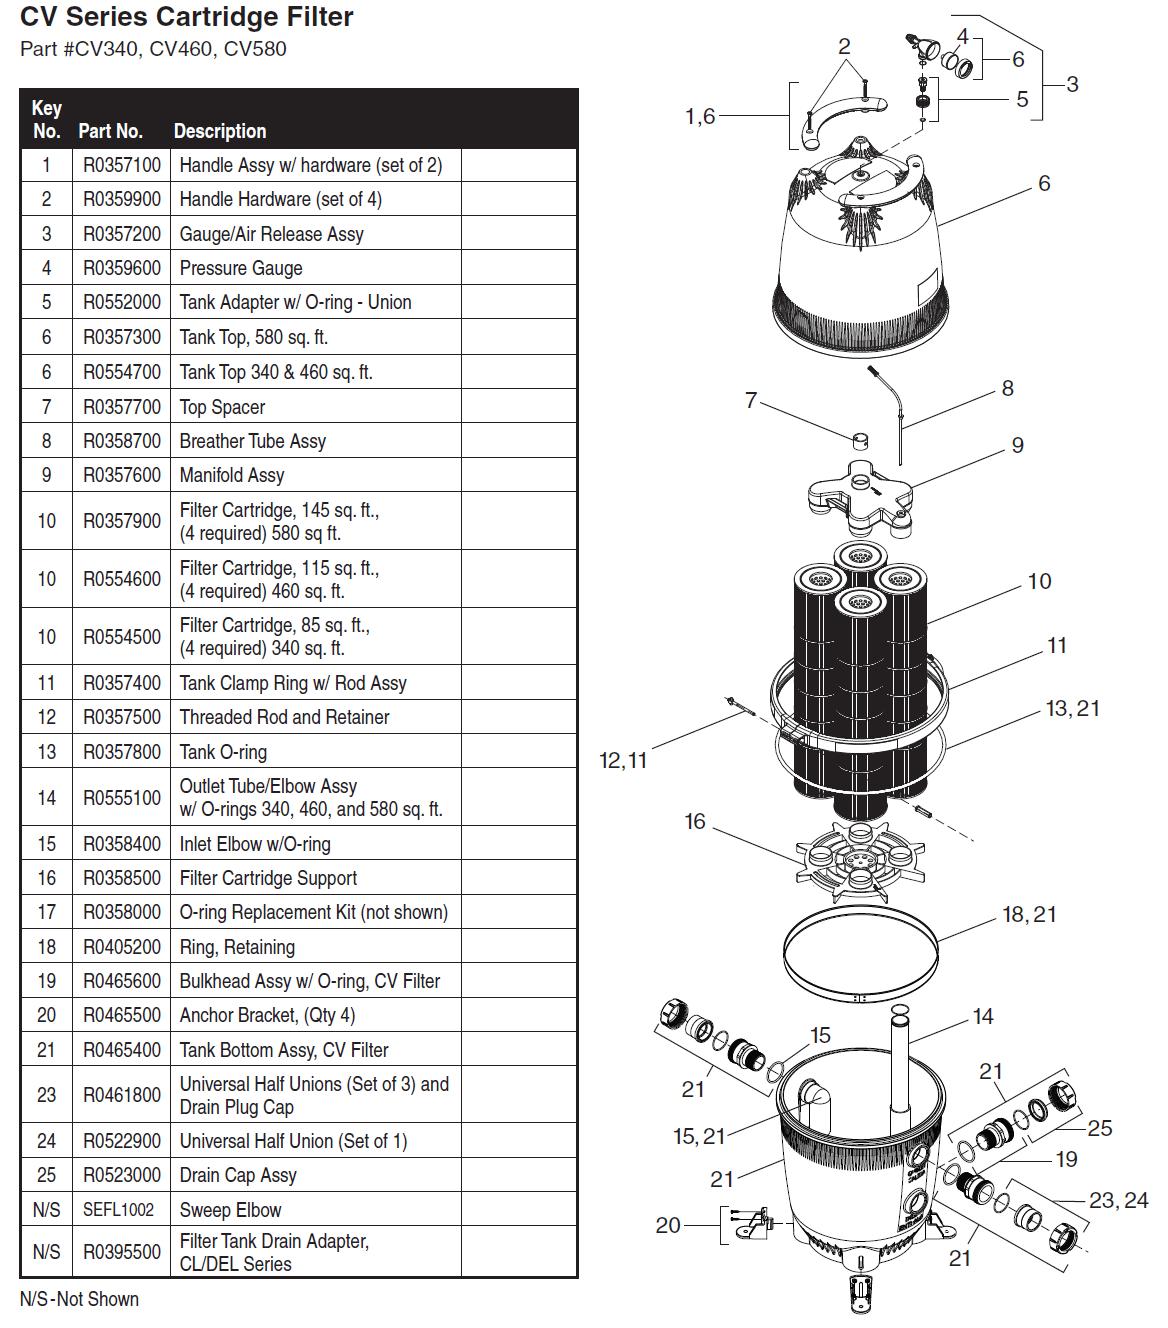 Jandy Cv Series Cartridge Filter Parts